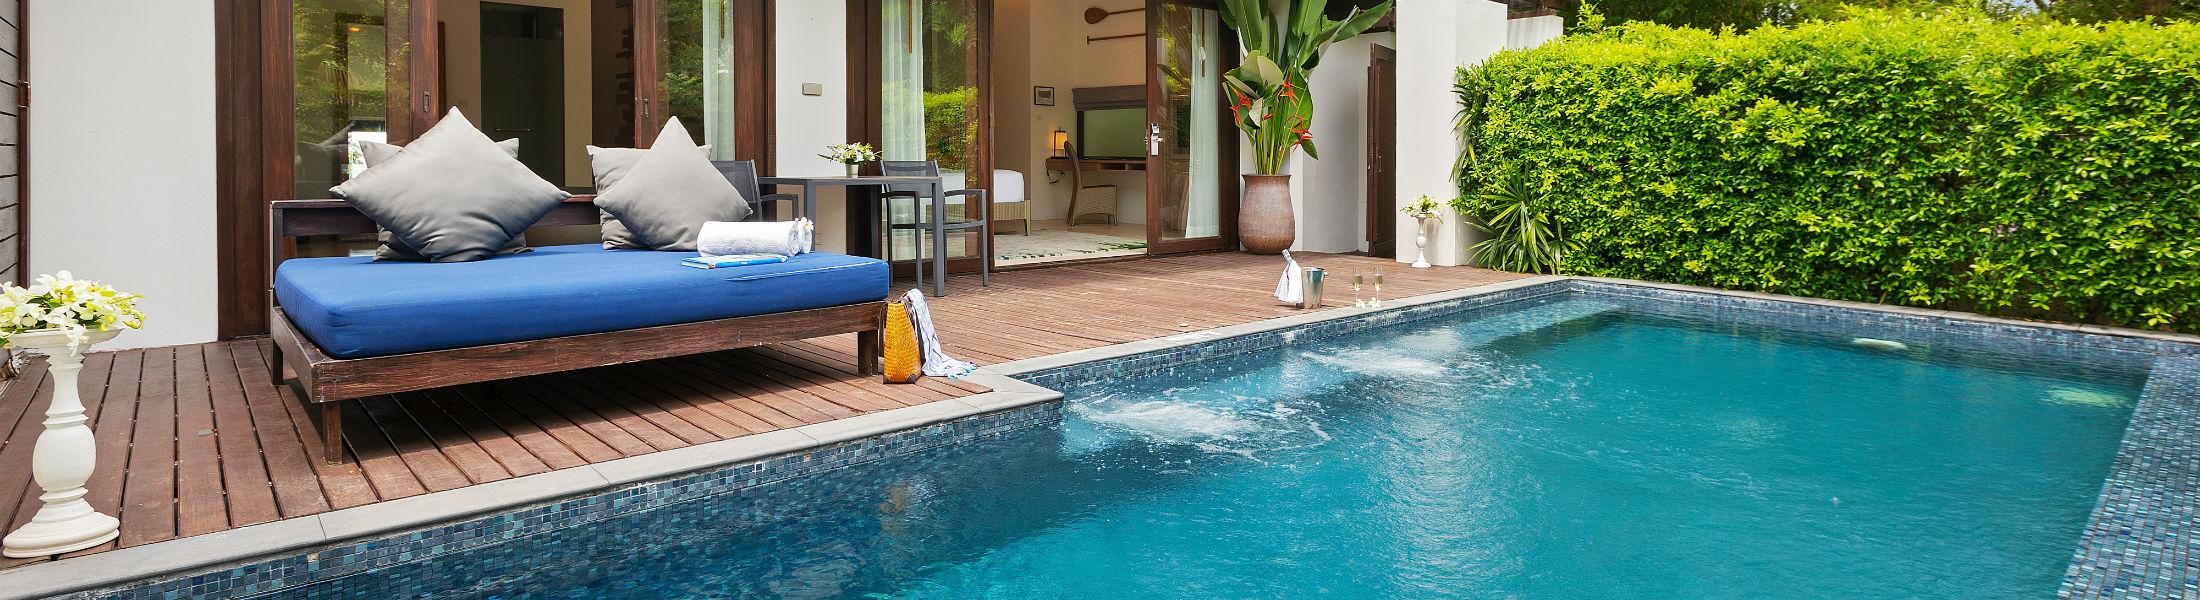 1 bedroom pool villa at the Outrigger koh samui beach resort